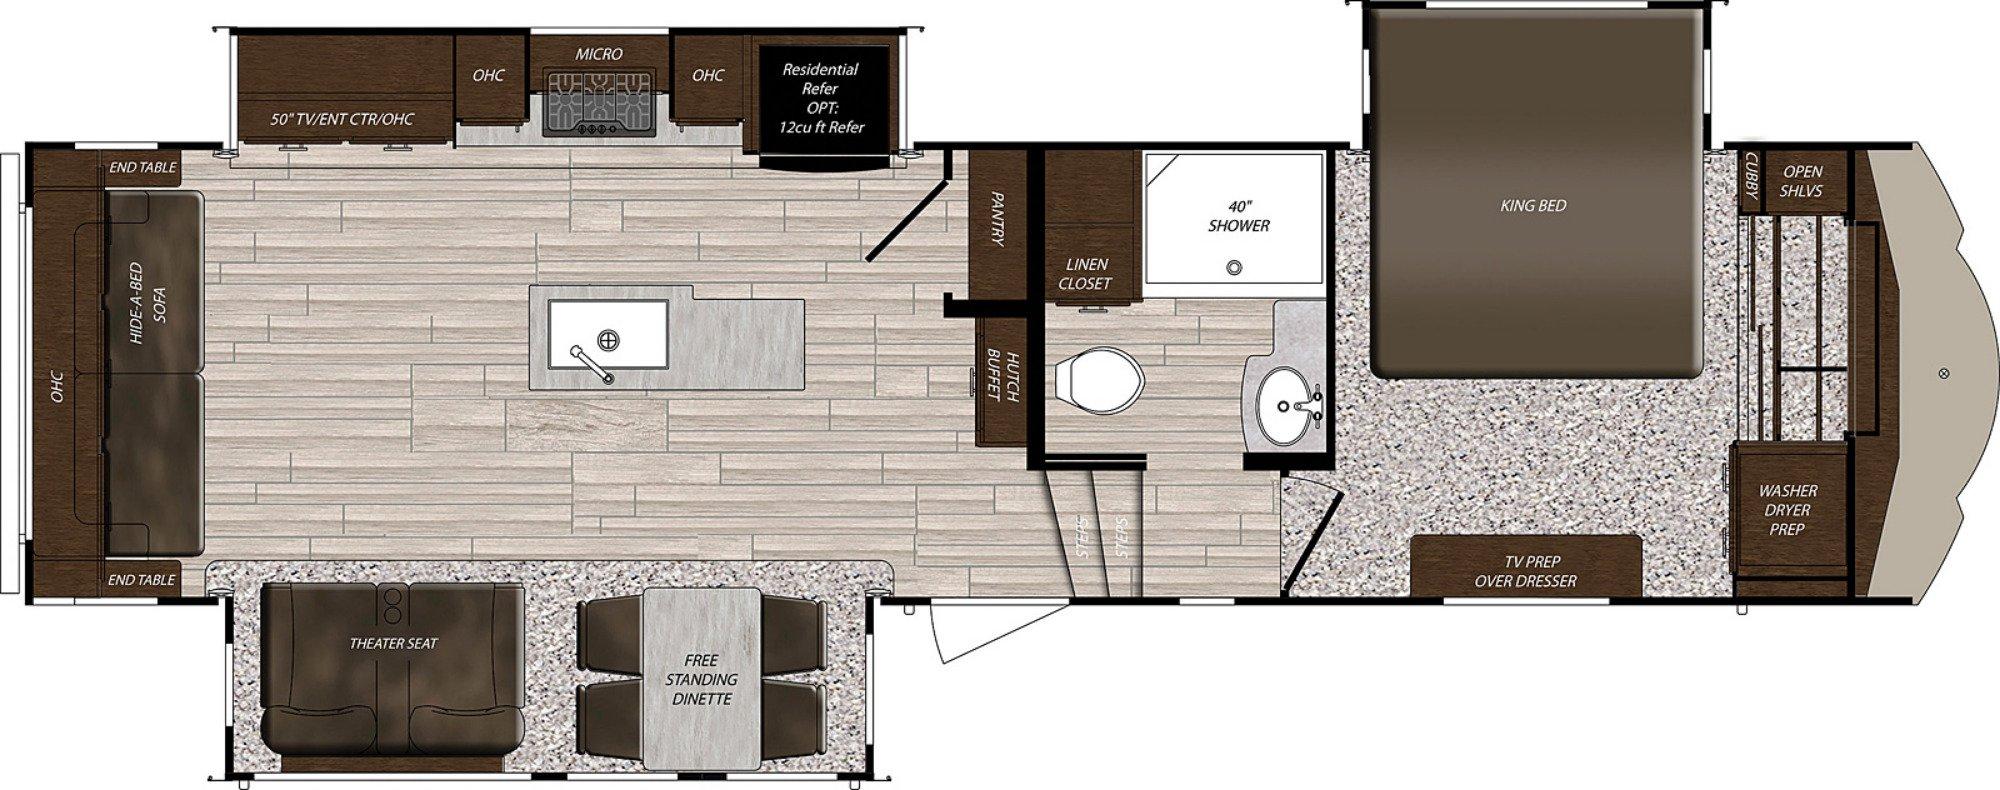 View Floor Plan for 2021 PRIME TIME SANIBEL 3102RSWB